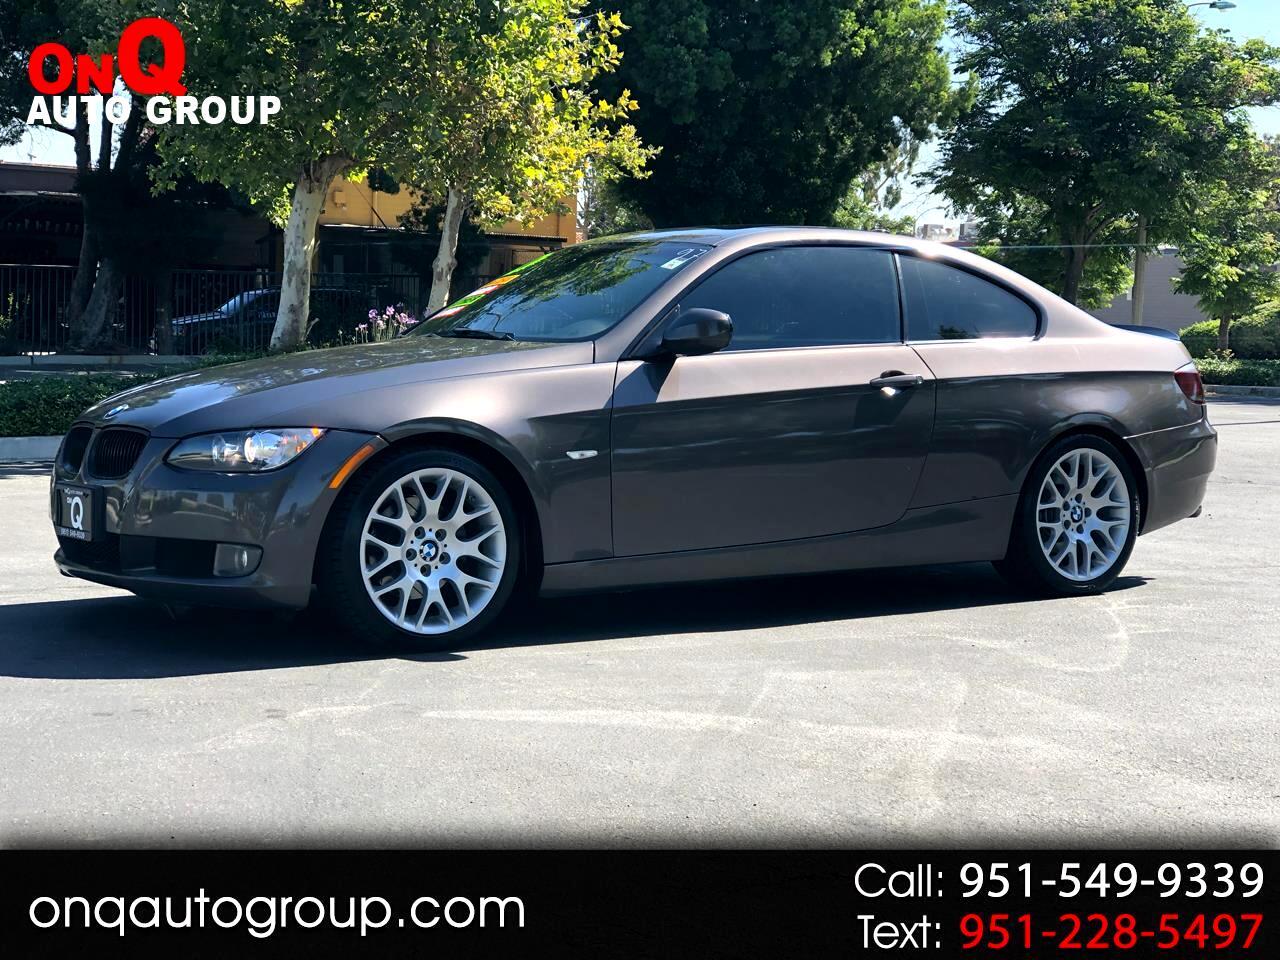 2010 BMW 3 Series 2dr Cpe 328i RWD